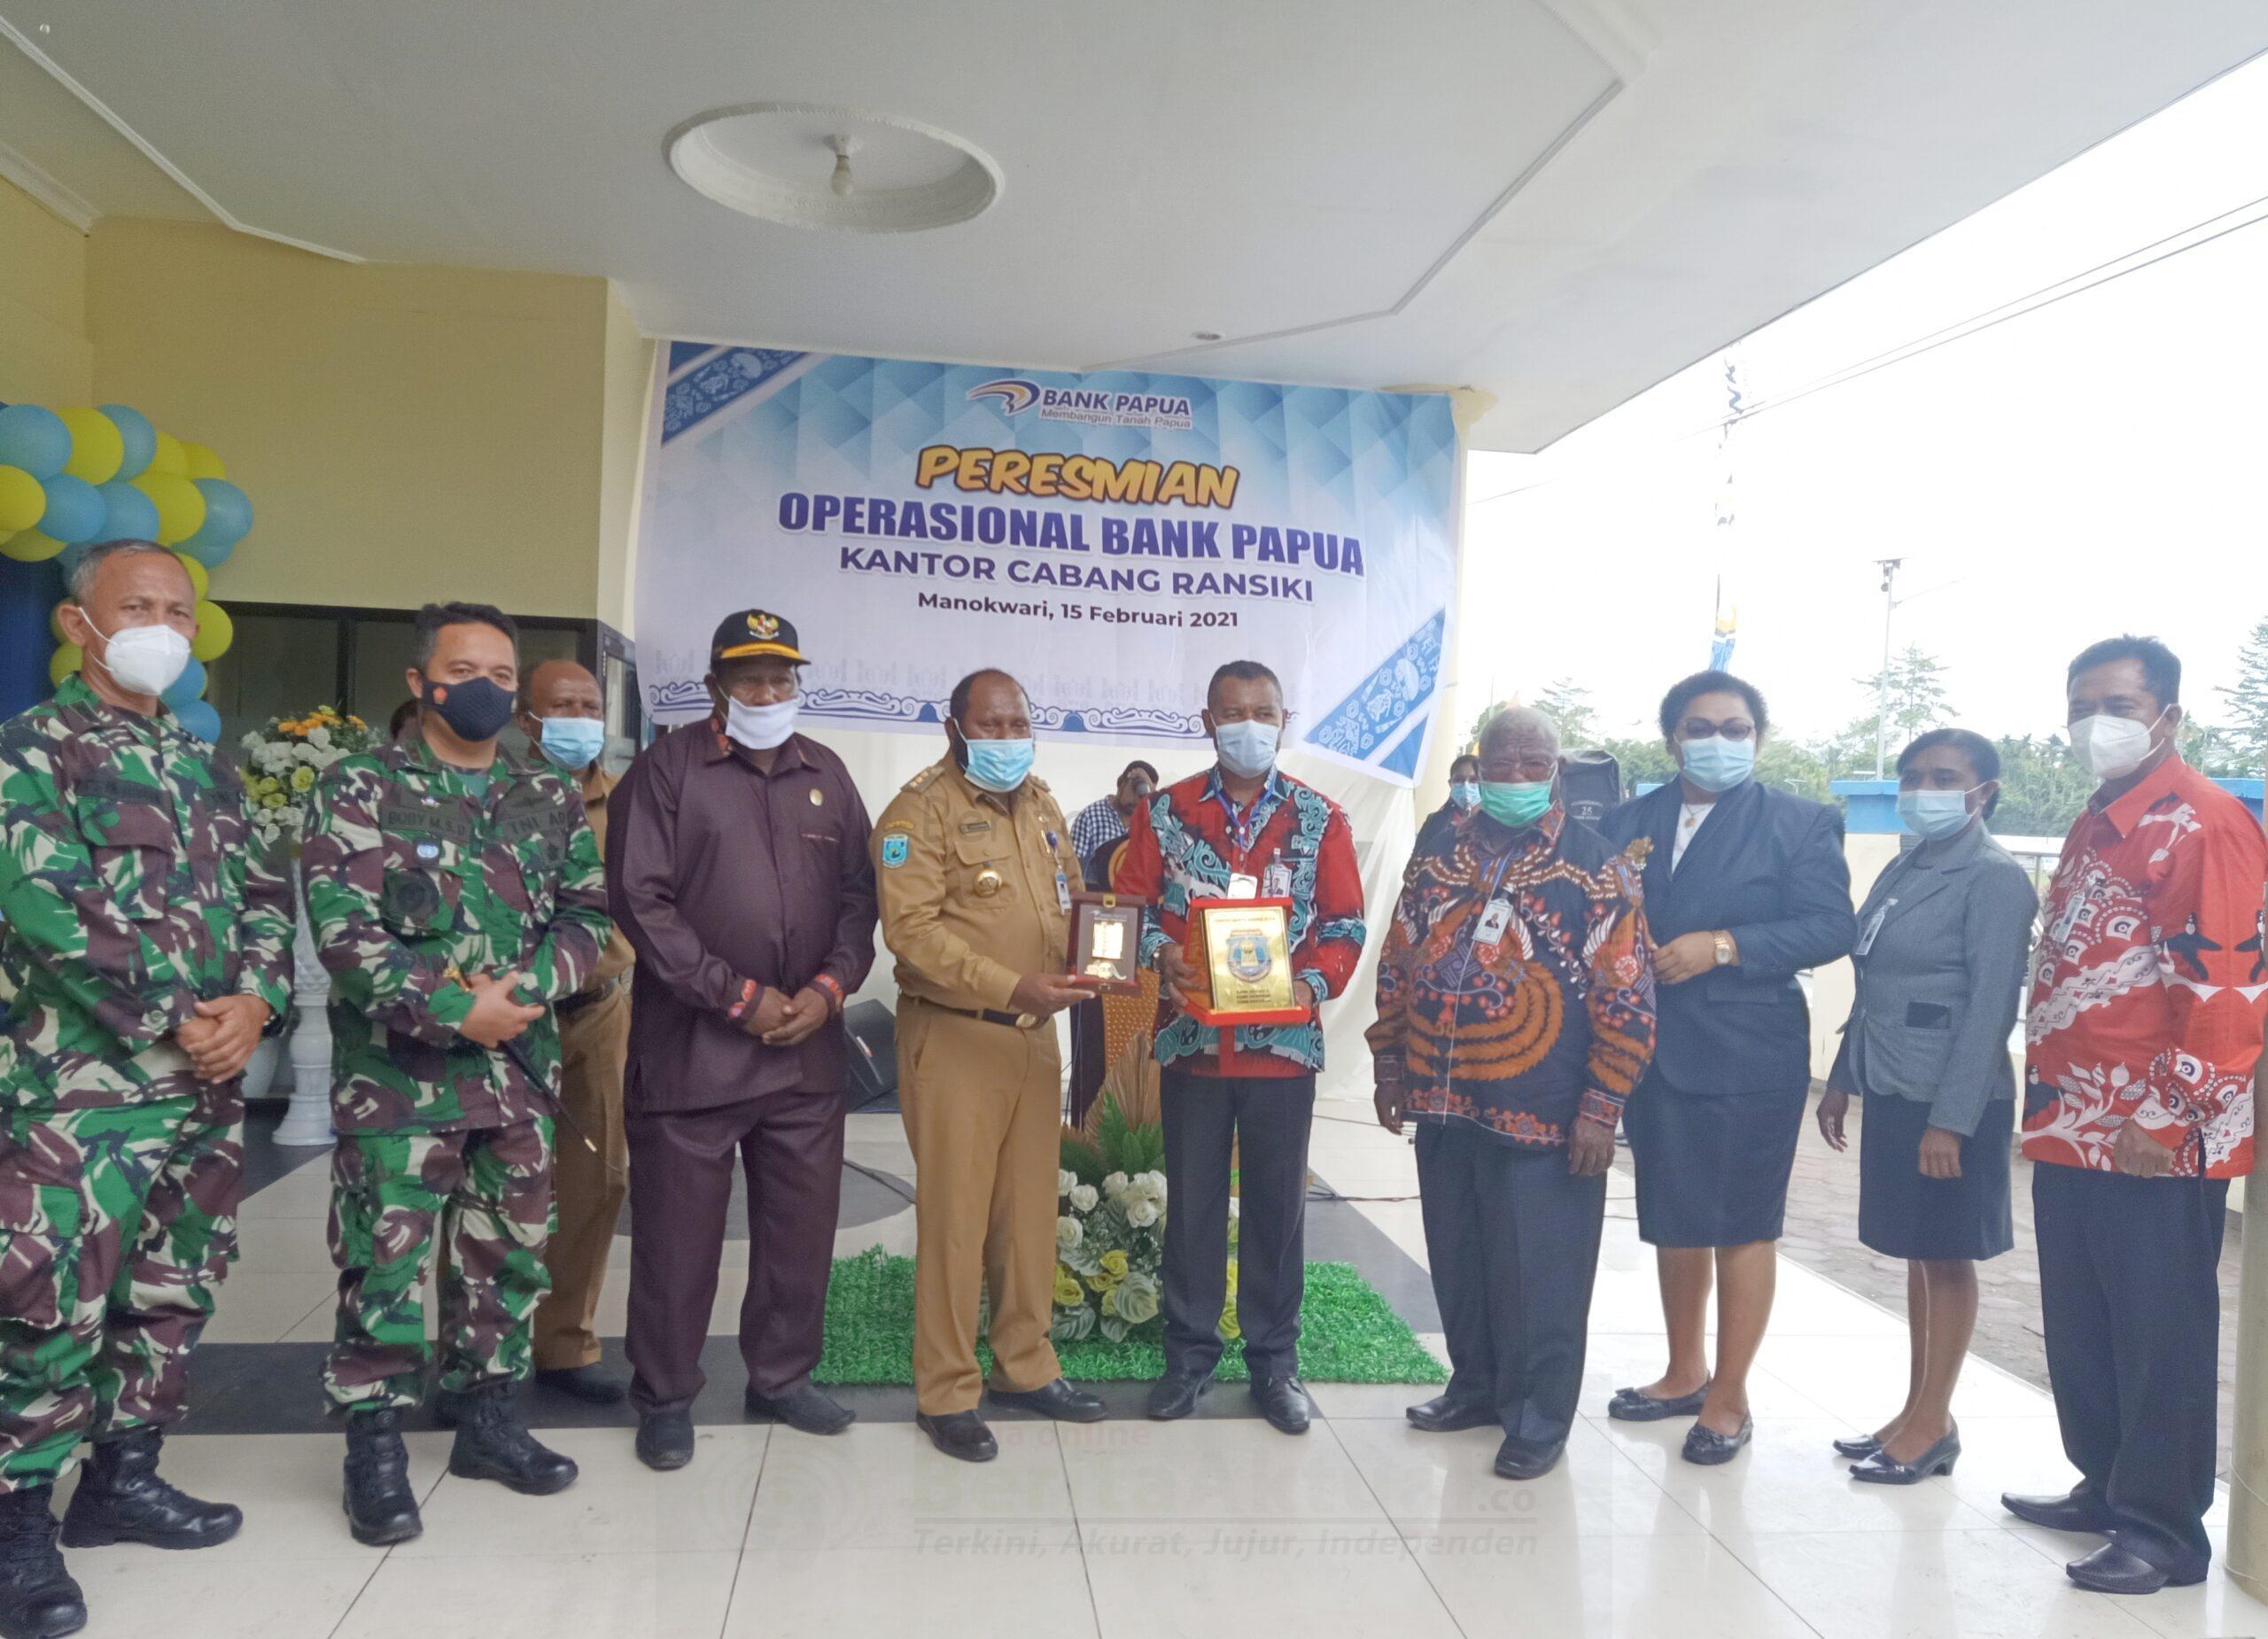 Bupati Manokwari Selatan, Resmikan KCP Ransiki Menjadi Kantor Cabang Bank Papua 1 IMG 20210215 224557 scaled